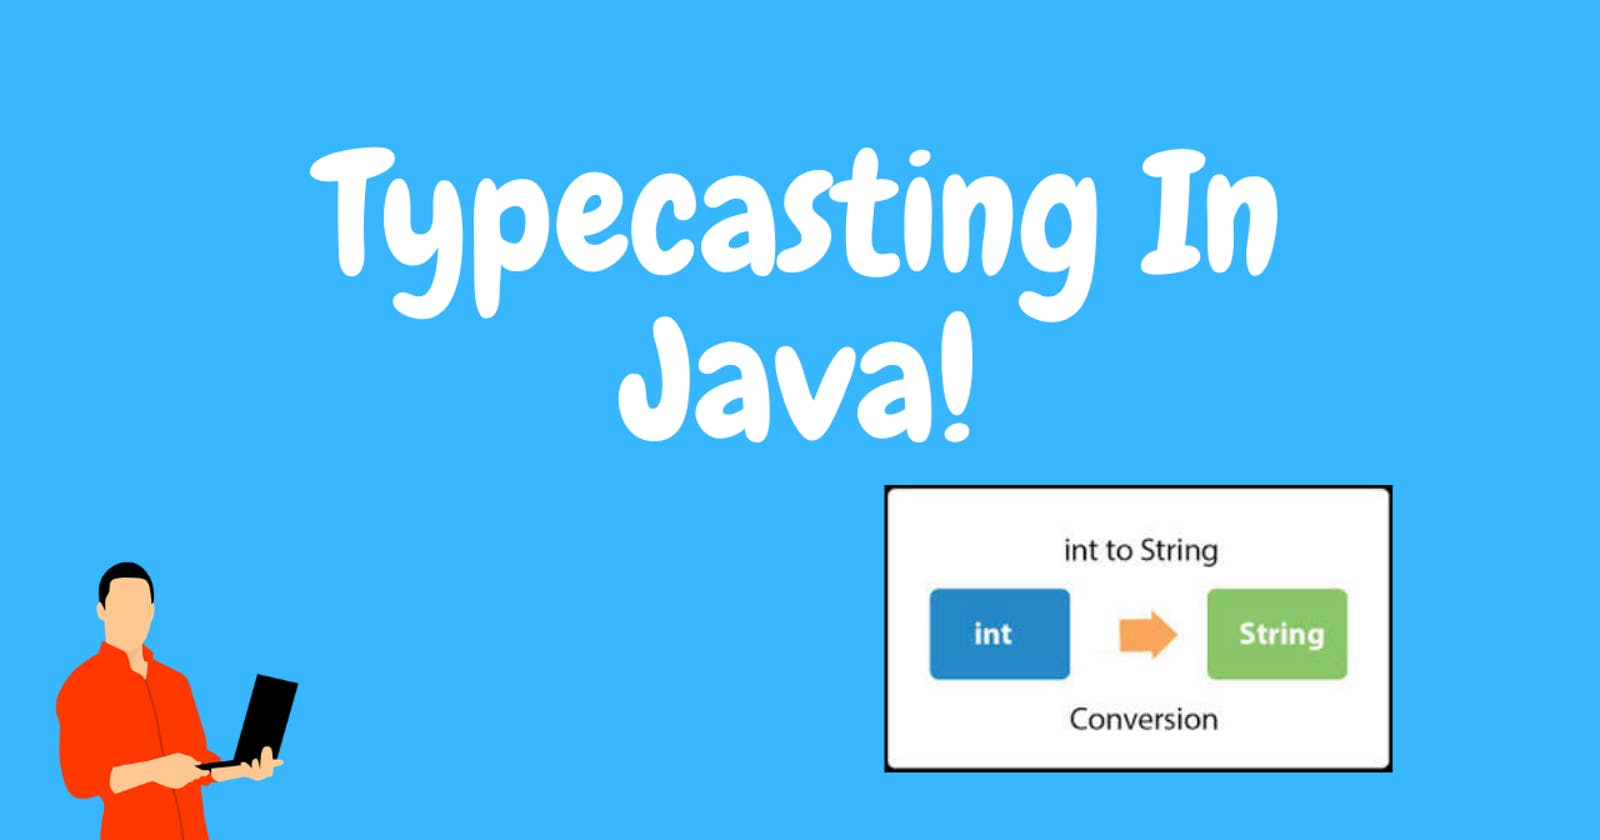 Typecasting In Java